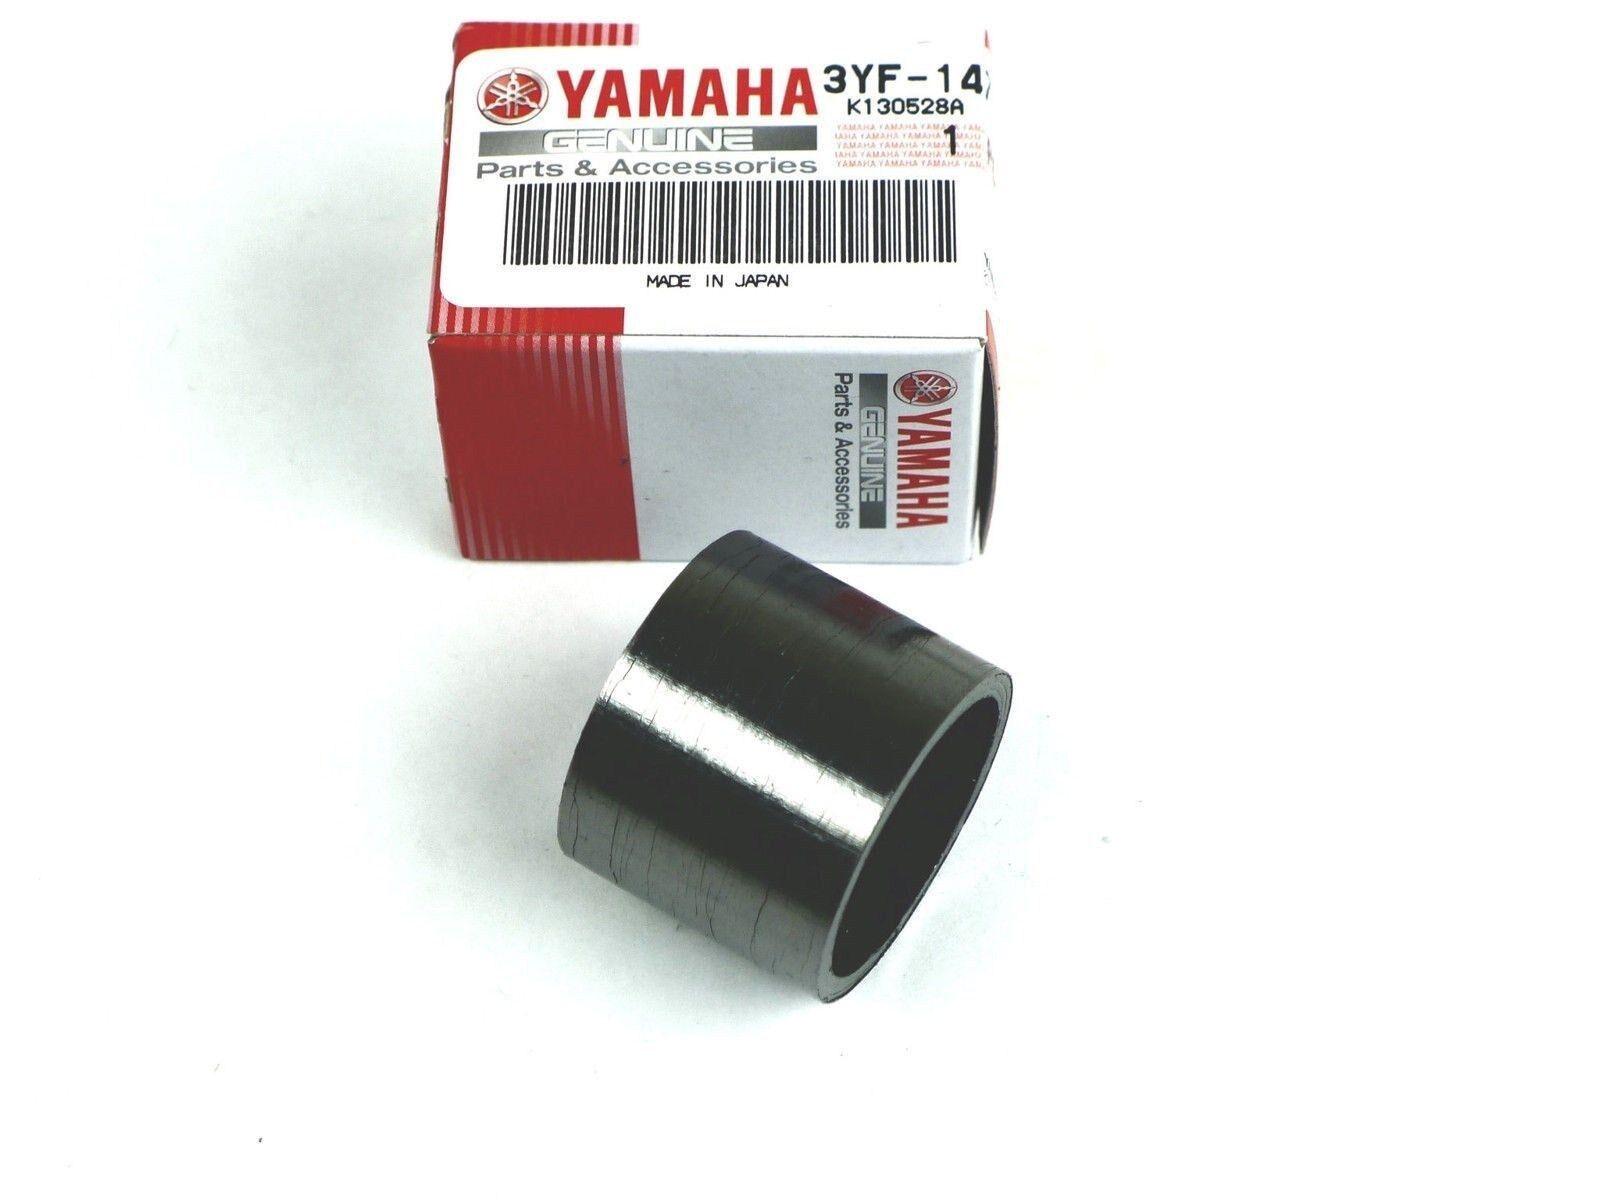 New Yamaha Moto-4 350 ATV Petcock Fuel Tank Switch Valve Assembly 1987-95